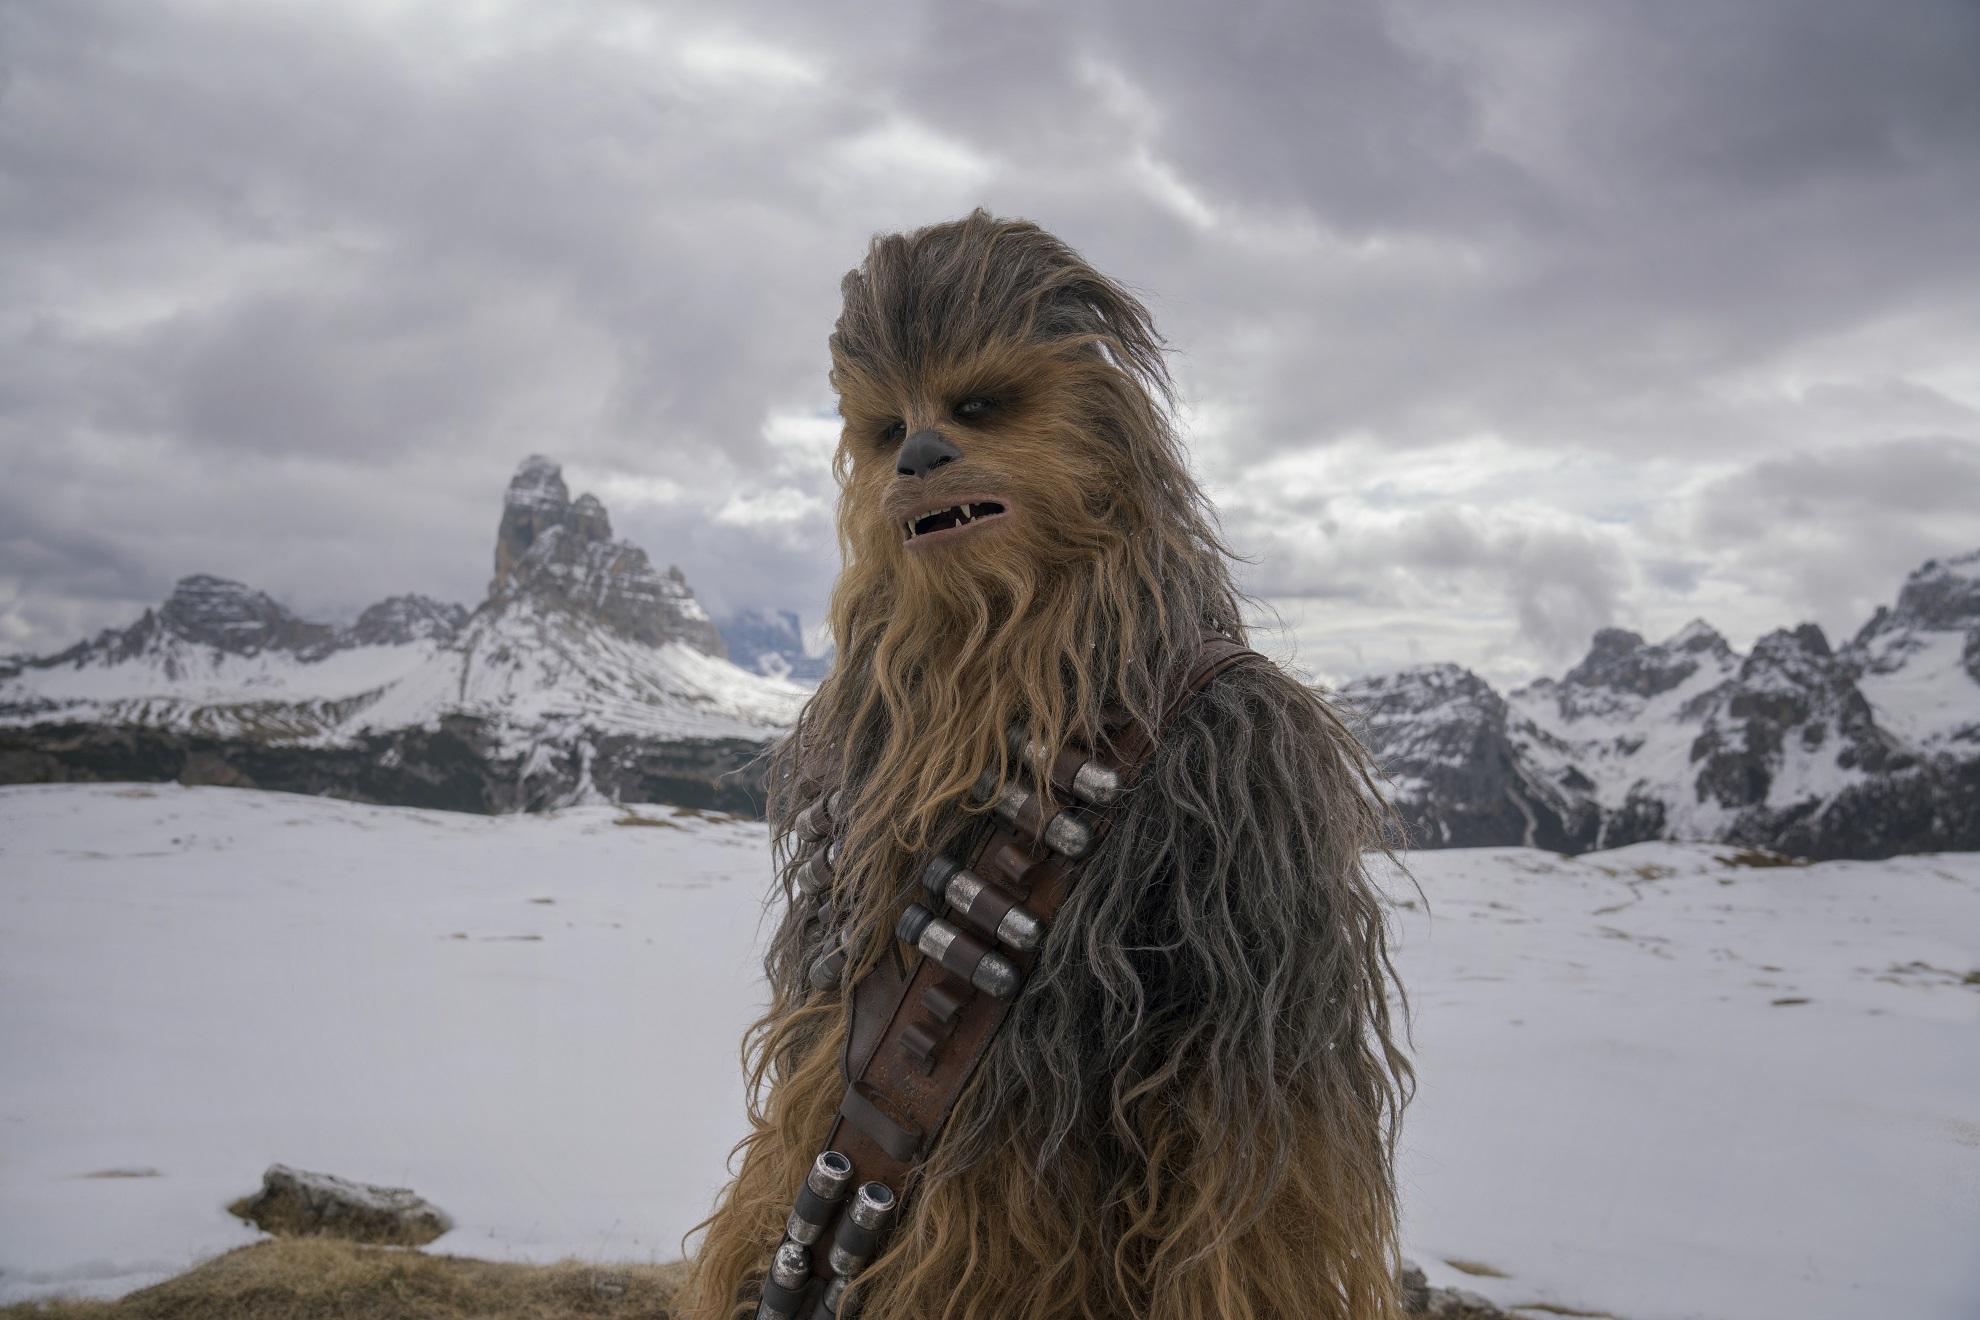 Solo A Star Wars Story Han Solo Chewbacca Chewie Spin-off Disney Test Kritik Heimkino Blu ray DVD Chewie